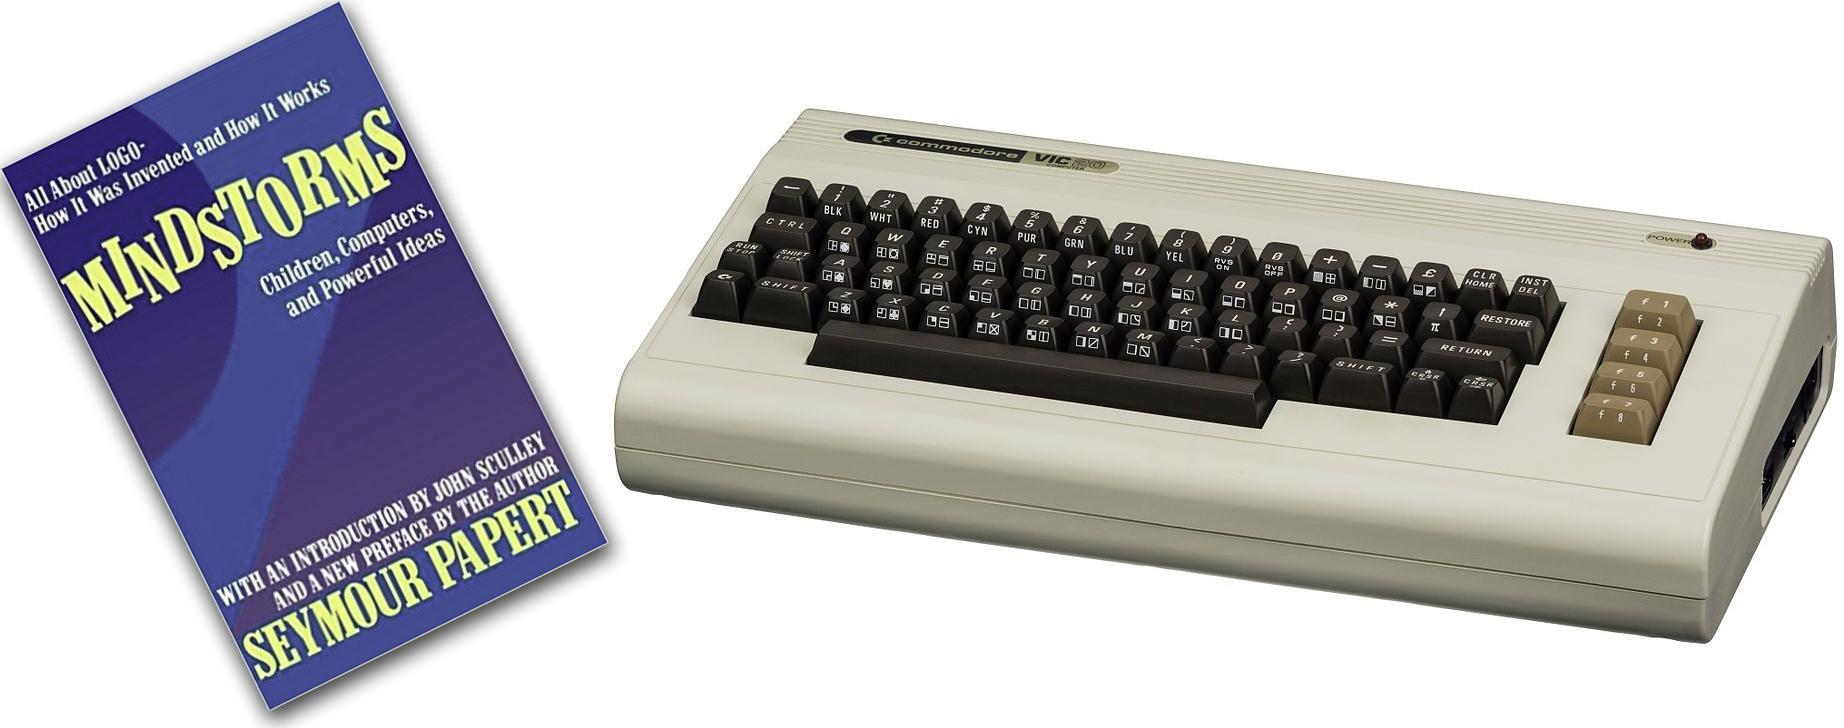 1980Computing.jpg